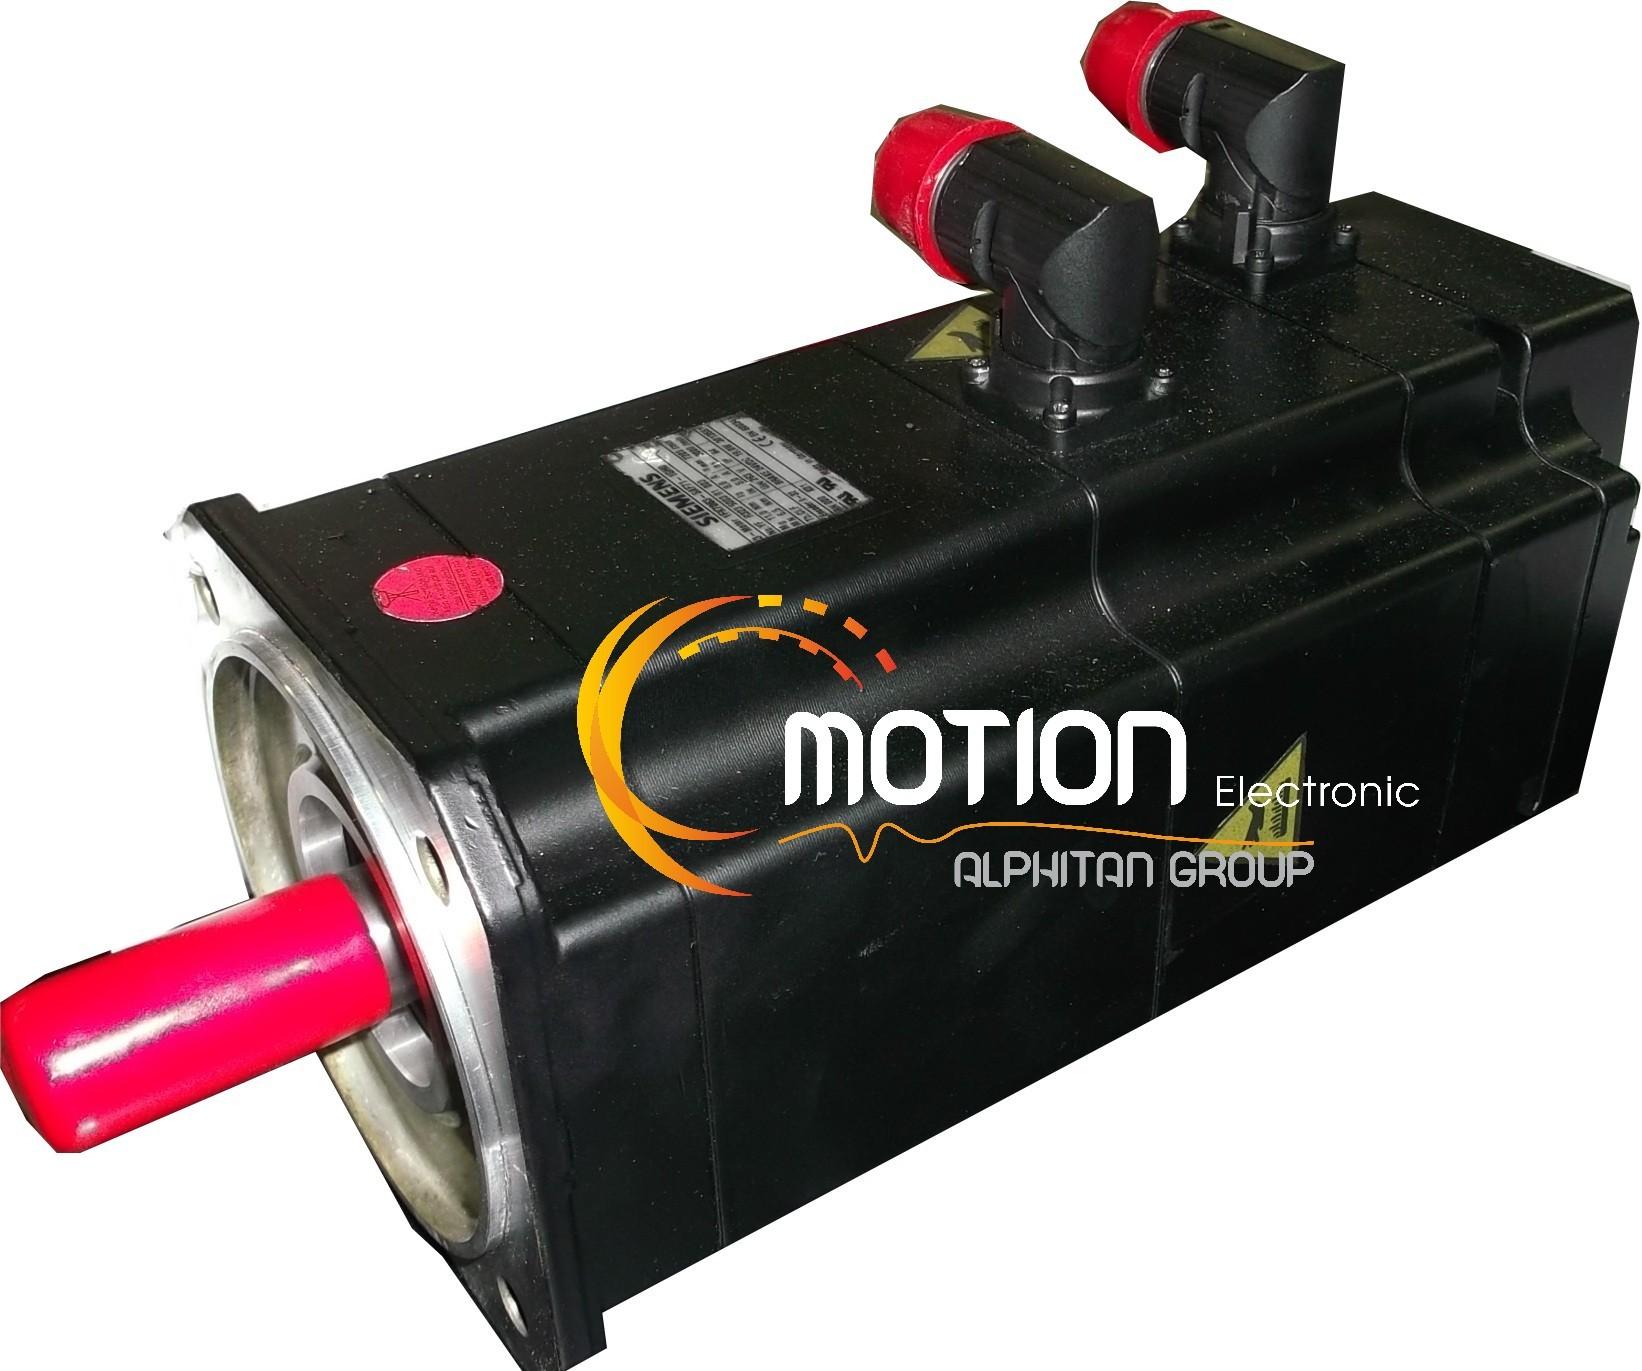 Siemens 1fk7063 5af71 1gh0 motor for Siemens electric motors catalog